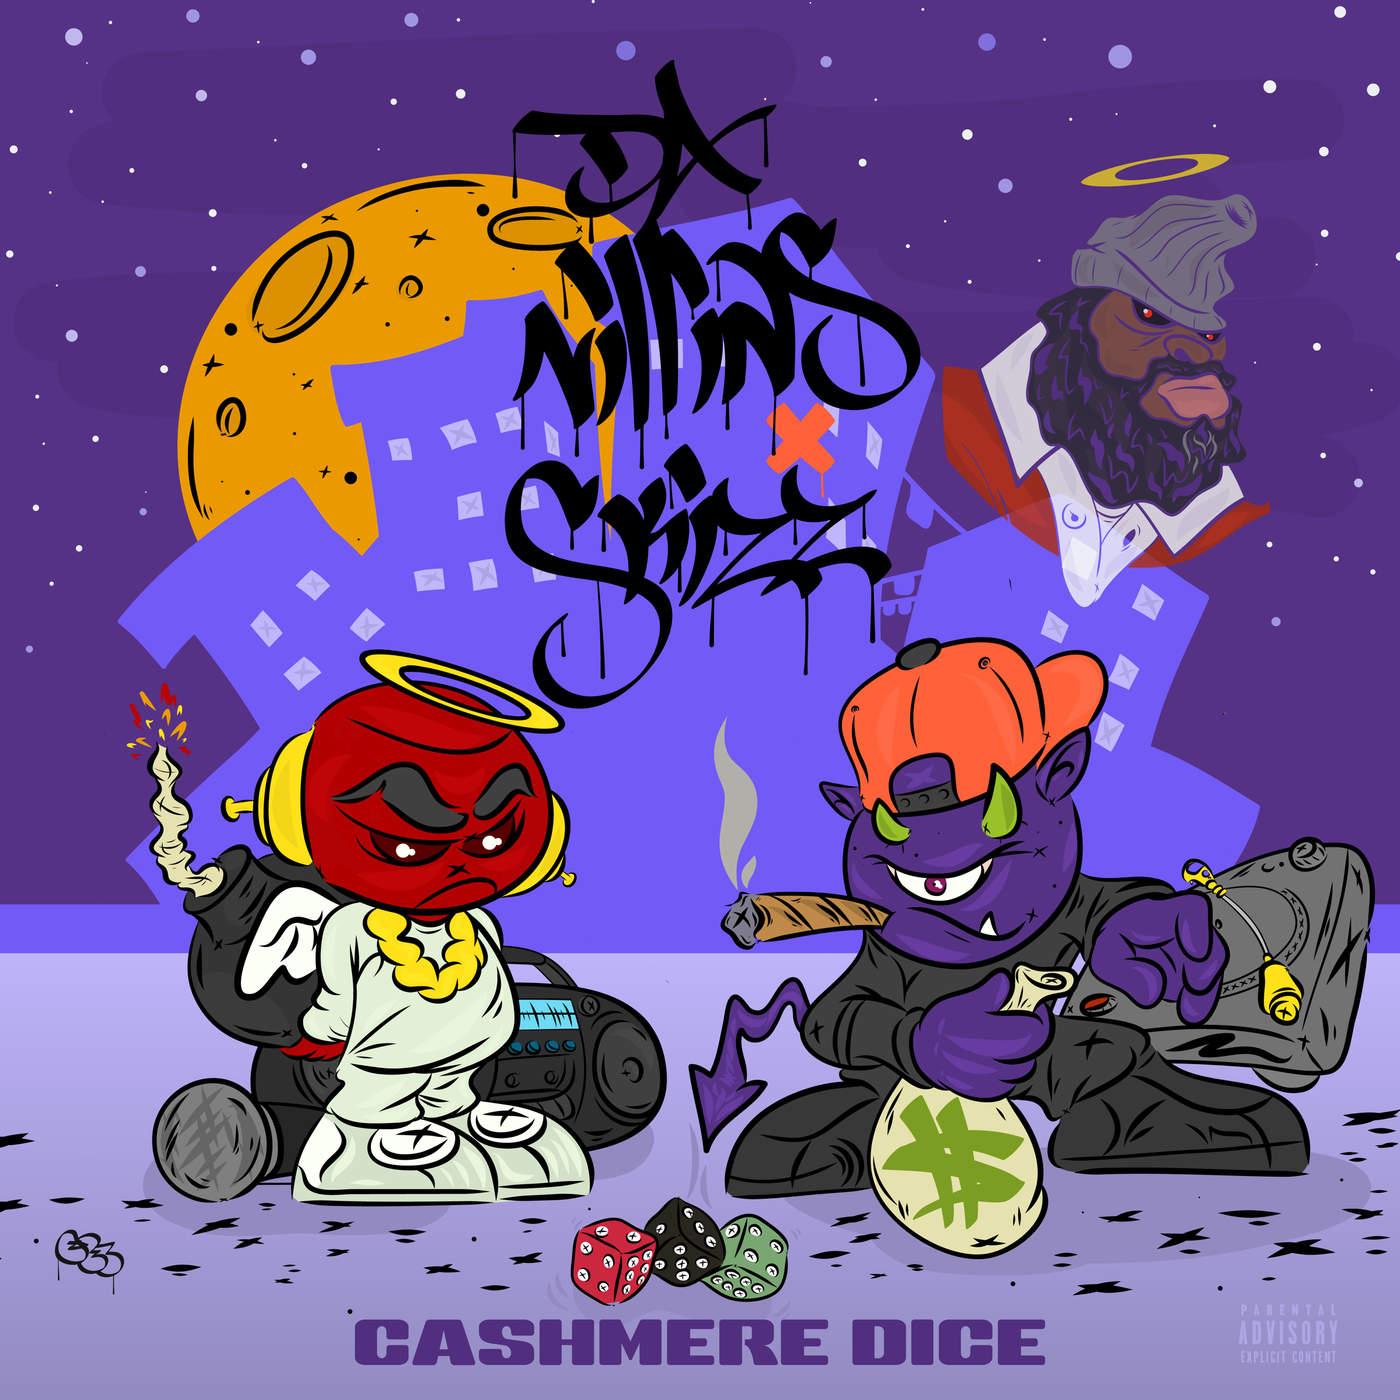 Da Villins & DJ Skizz - Cashmere Dice Cover